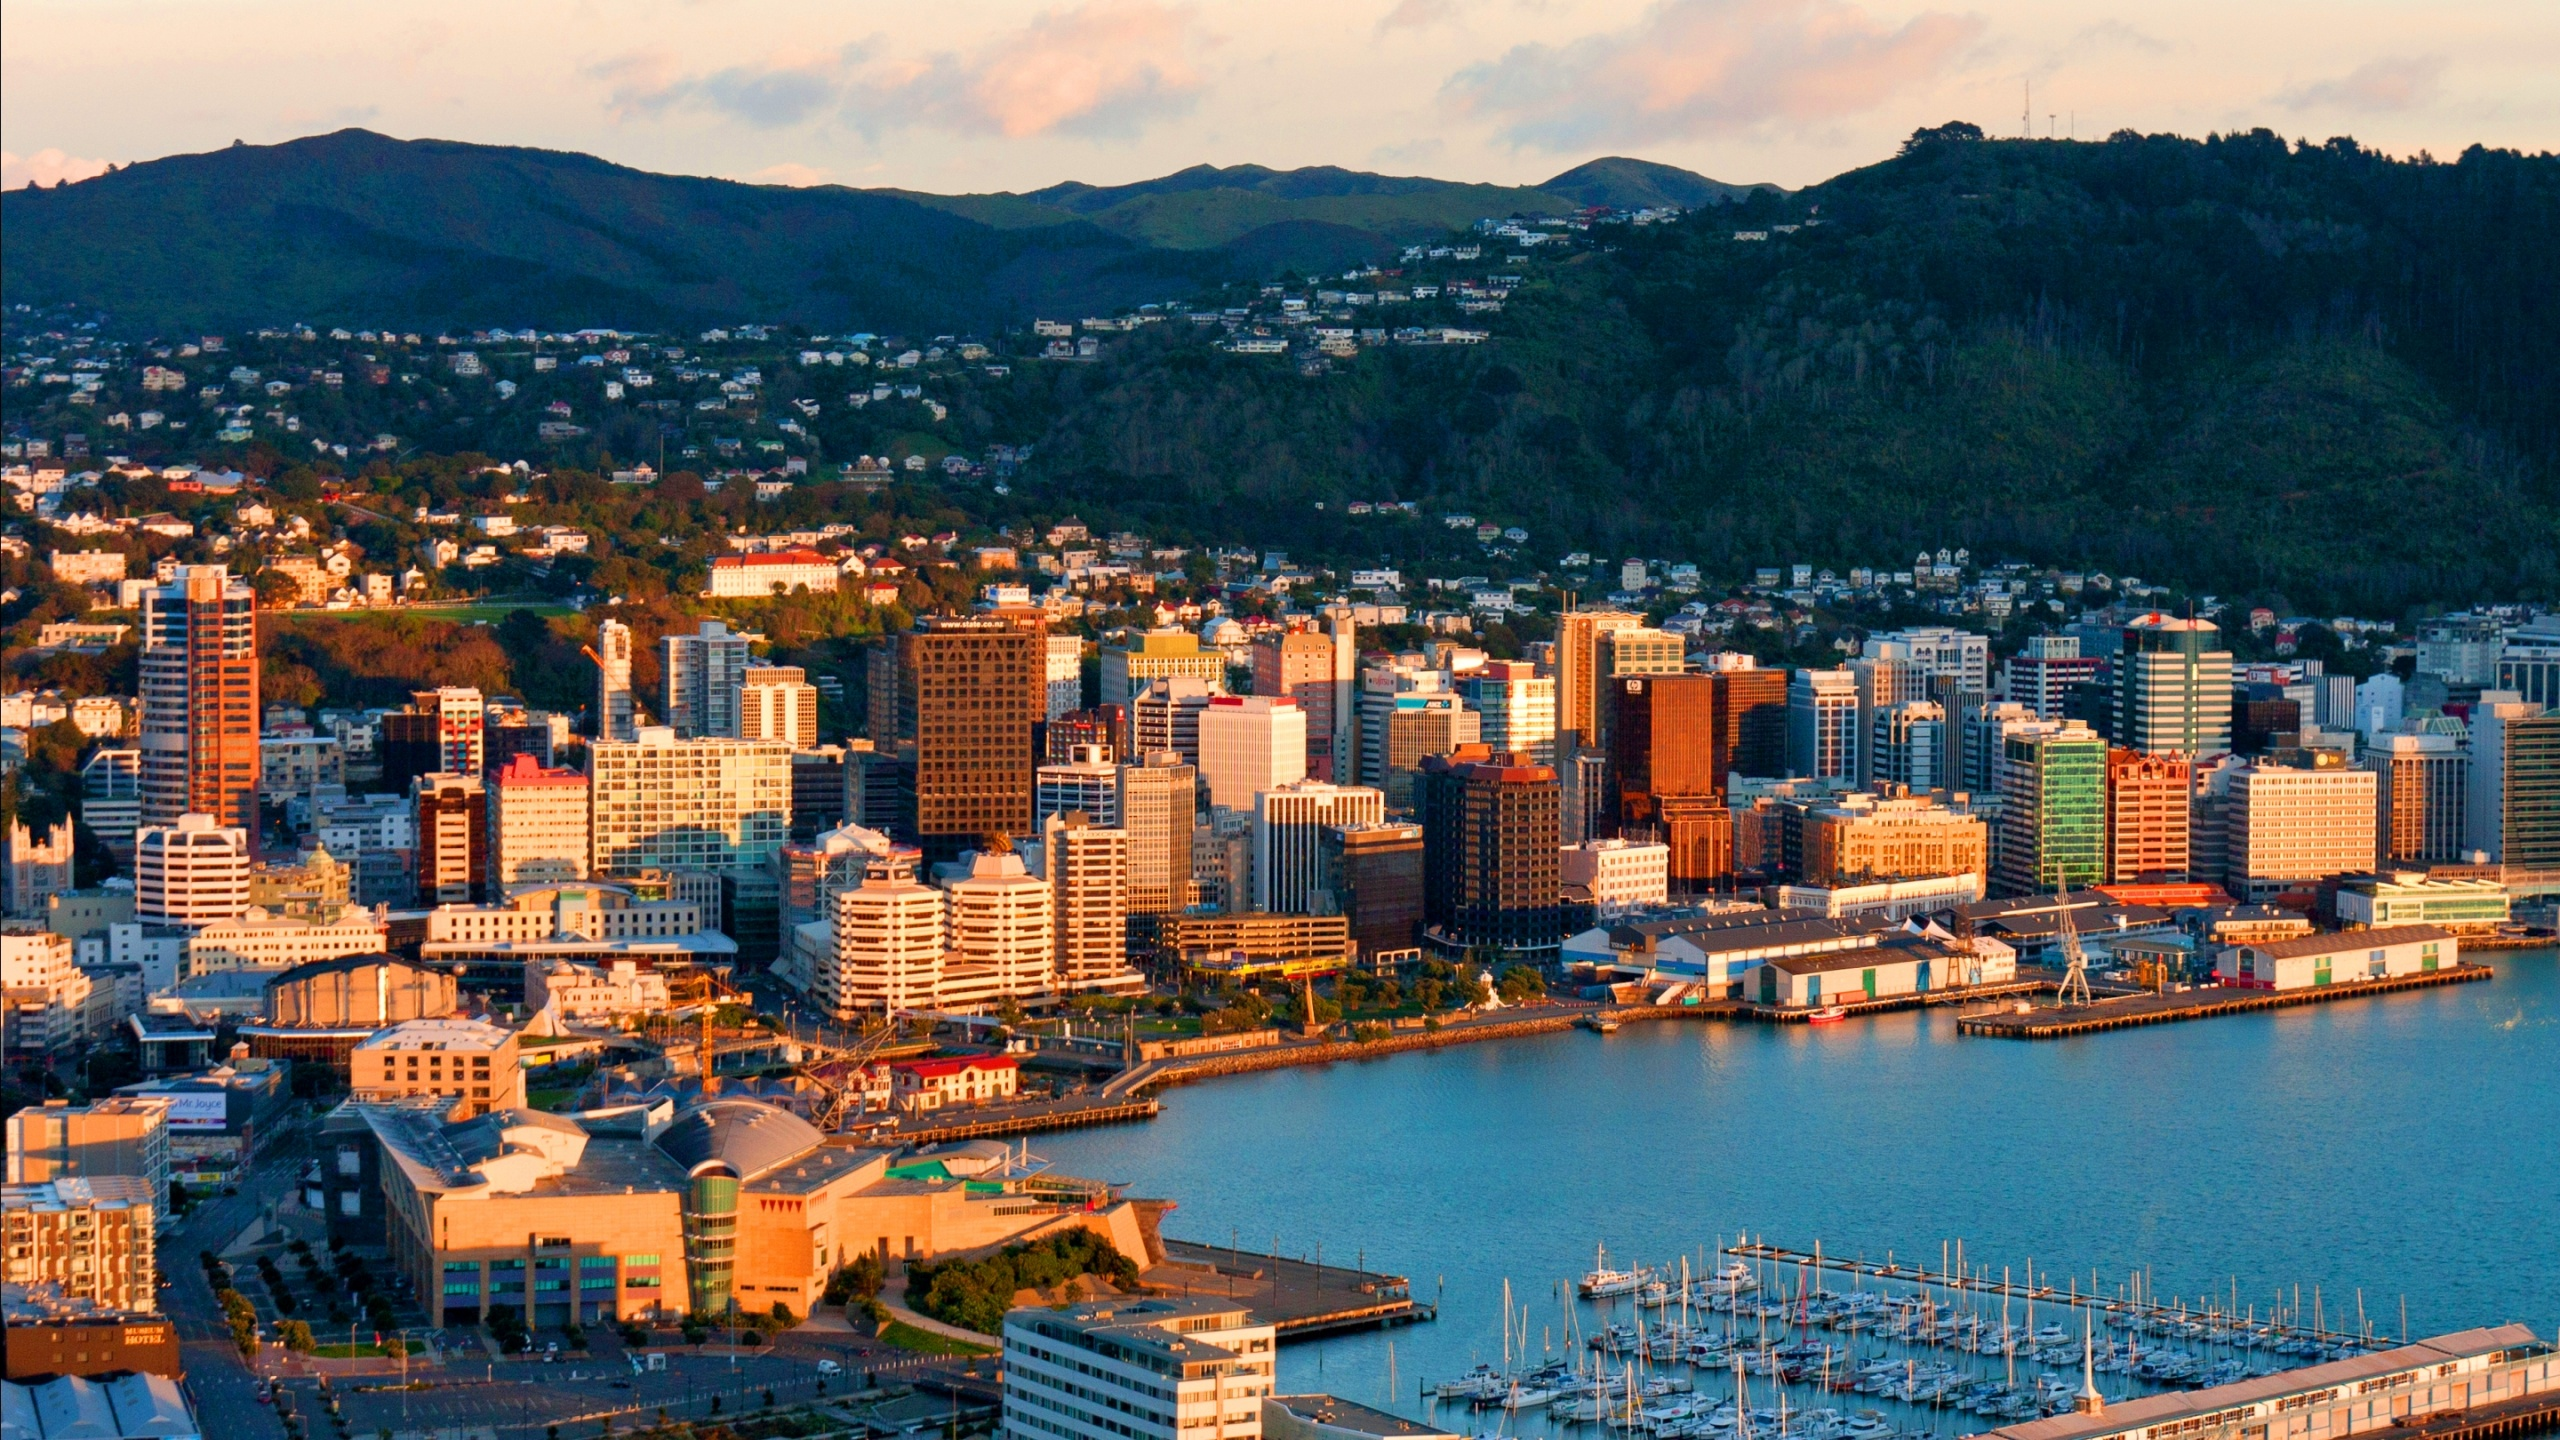 Wellington City New Zealand Wallpapers   2560x1440   1509535 2560x1440